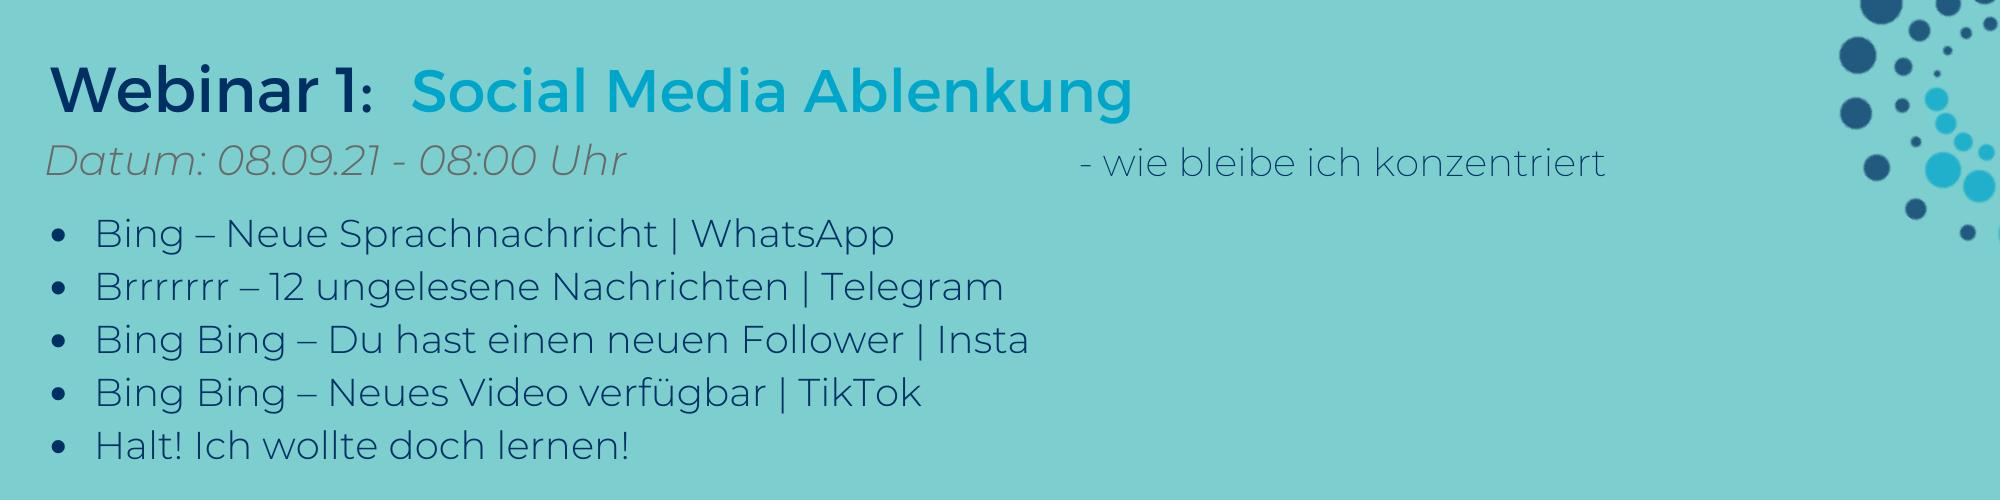 Azubi-Webinar-Reihe Social Media Ablenkung